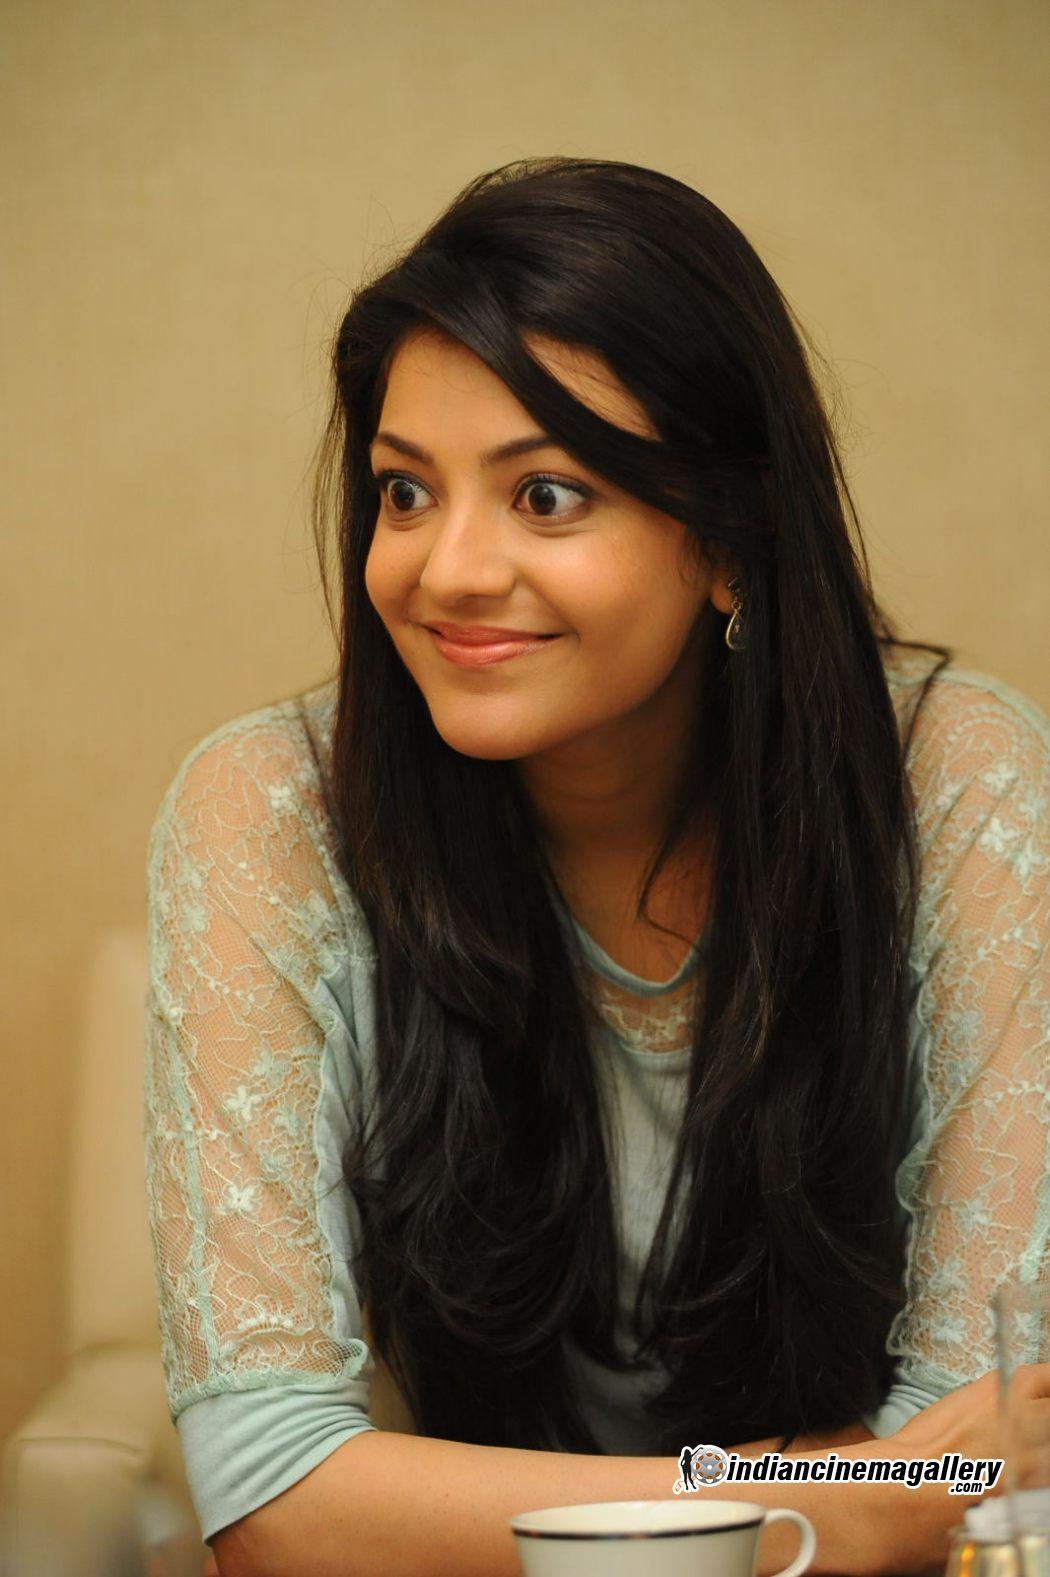 kajal agarwal | beauty girl, most beautiful indian actress